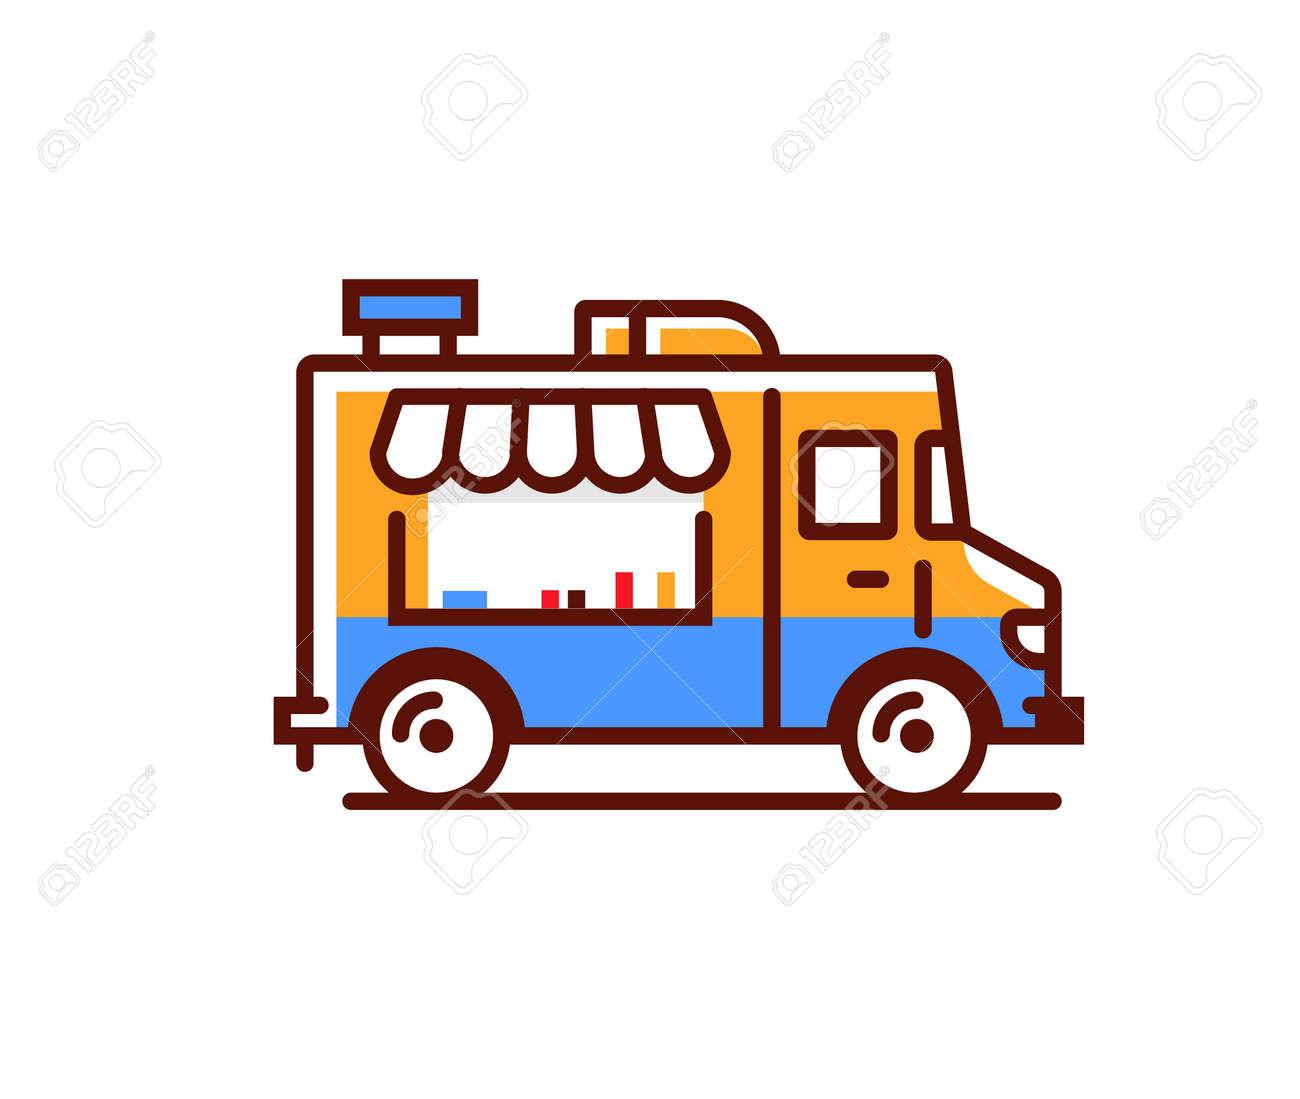 Food truck logo icon. Vector foodtruck kitchen street van design icon - 168932603